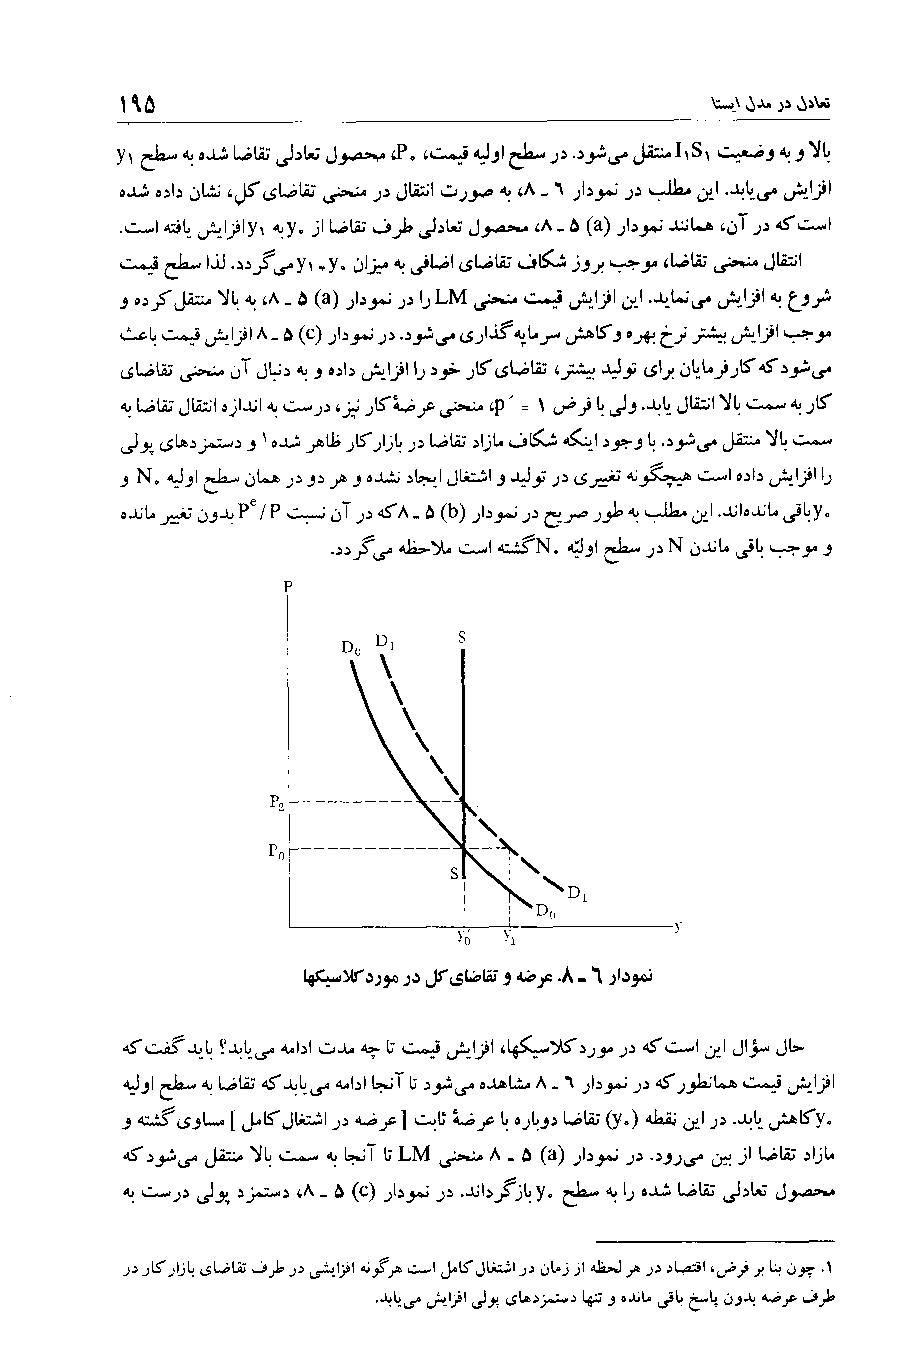 کتاب اقتصاد کلان ویلیام اچ. برانسون